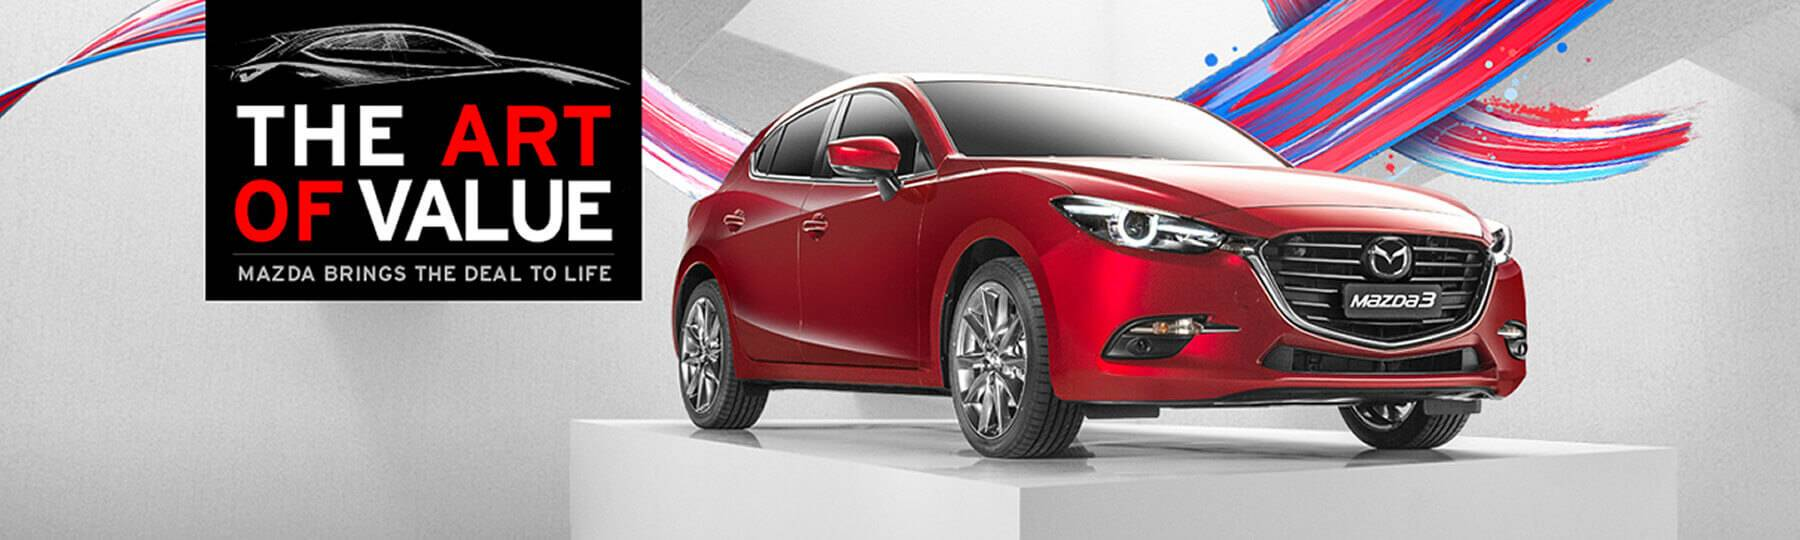 Mazda Factory Offer July